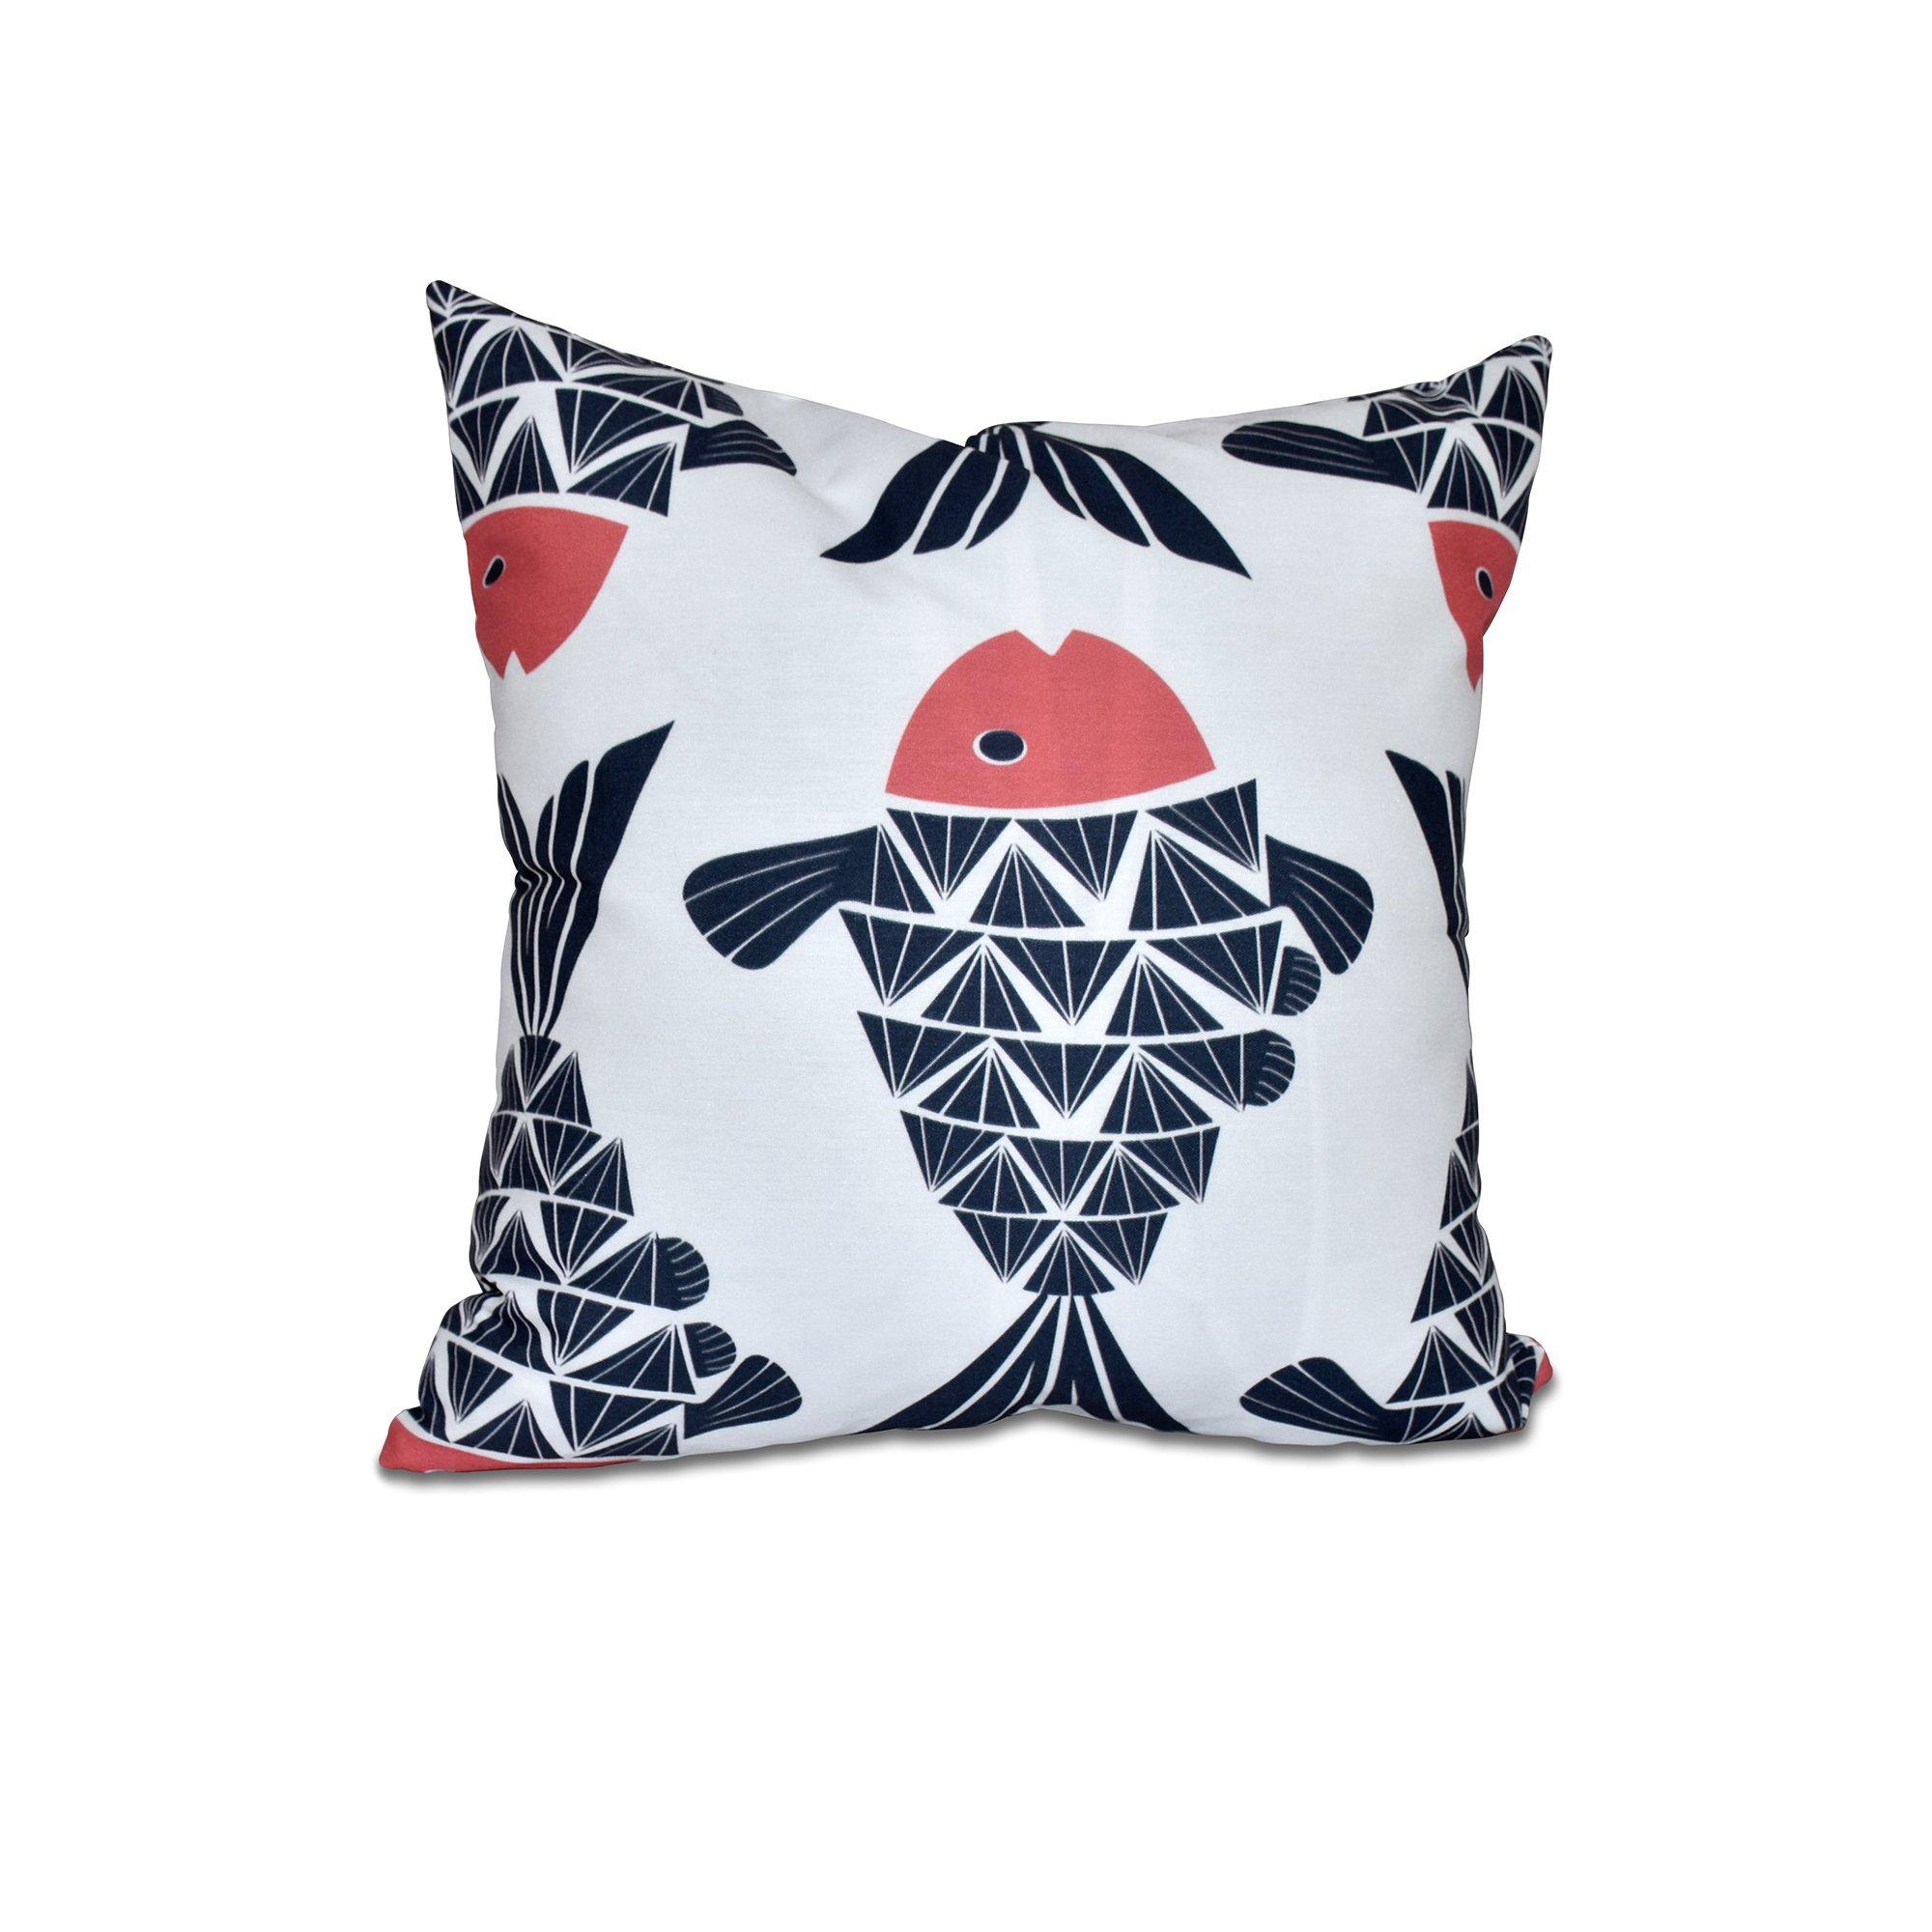 E by design O5PAN427BL14OR15-20 20 x 20 Big Fish Animal Print Blue Outdoor Pillow